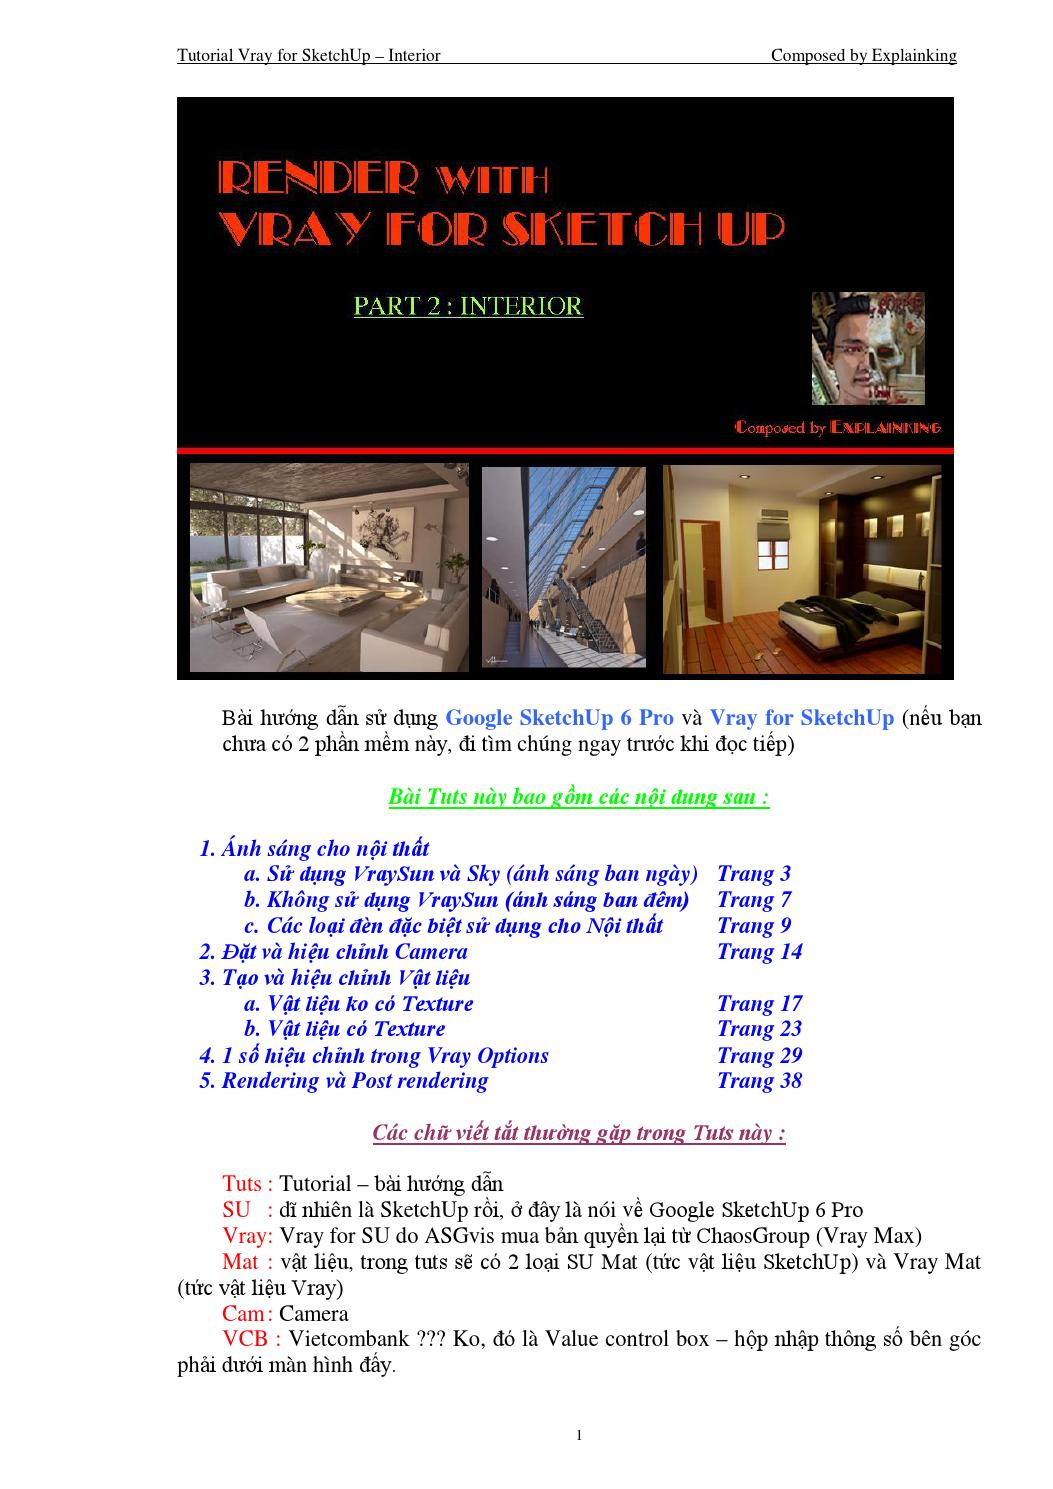 Vray4SketchUp Tutorial_Interior Settings_Vietnamese by Explainking Nguyễn Hoàng Vũ - issuu